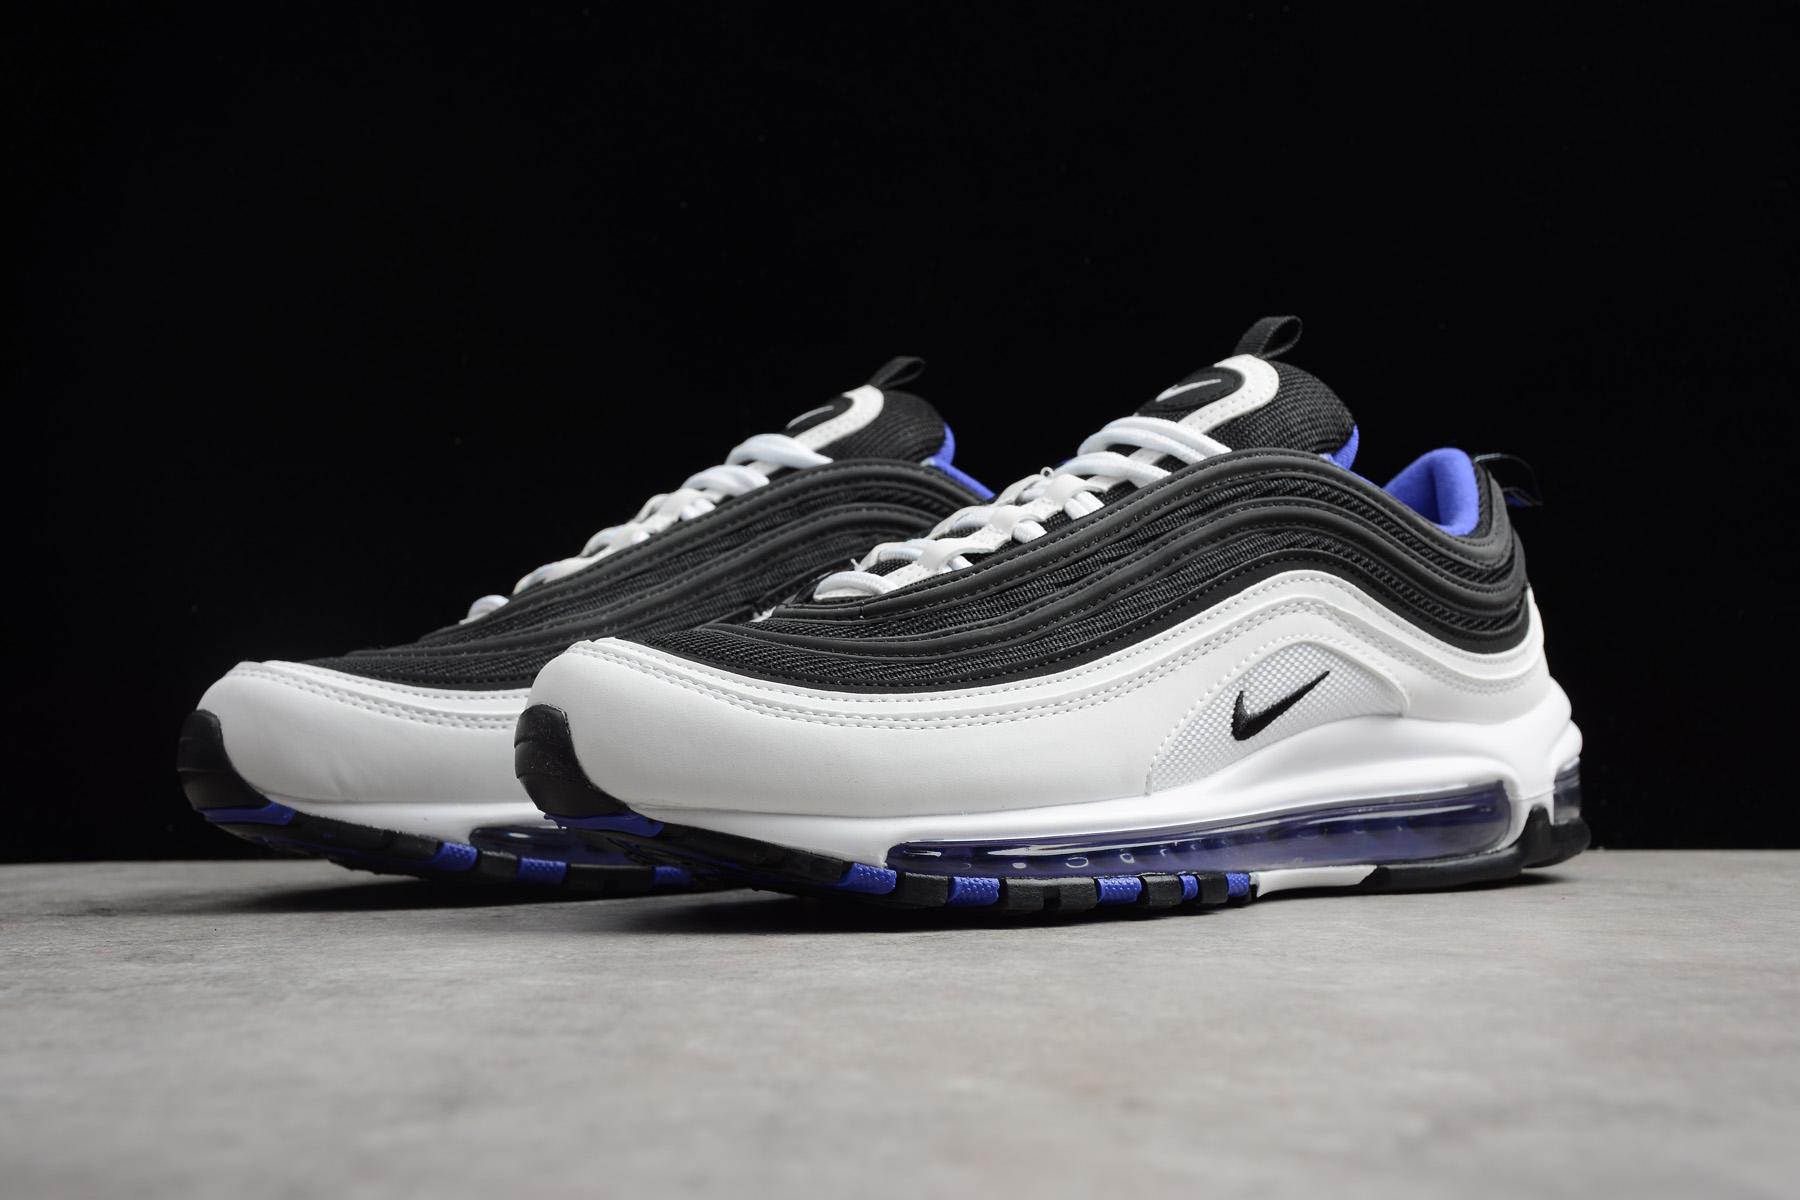 New Nike Air Max 97 White/Black-Persin Violet Men's Size ...